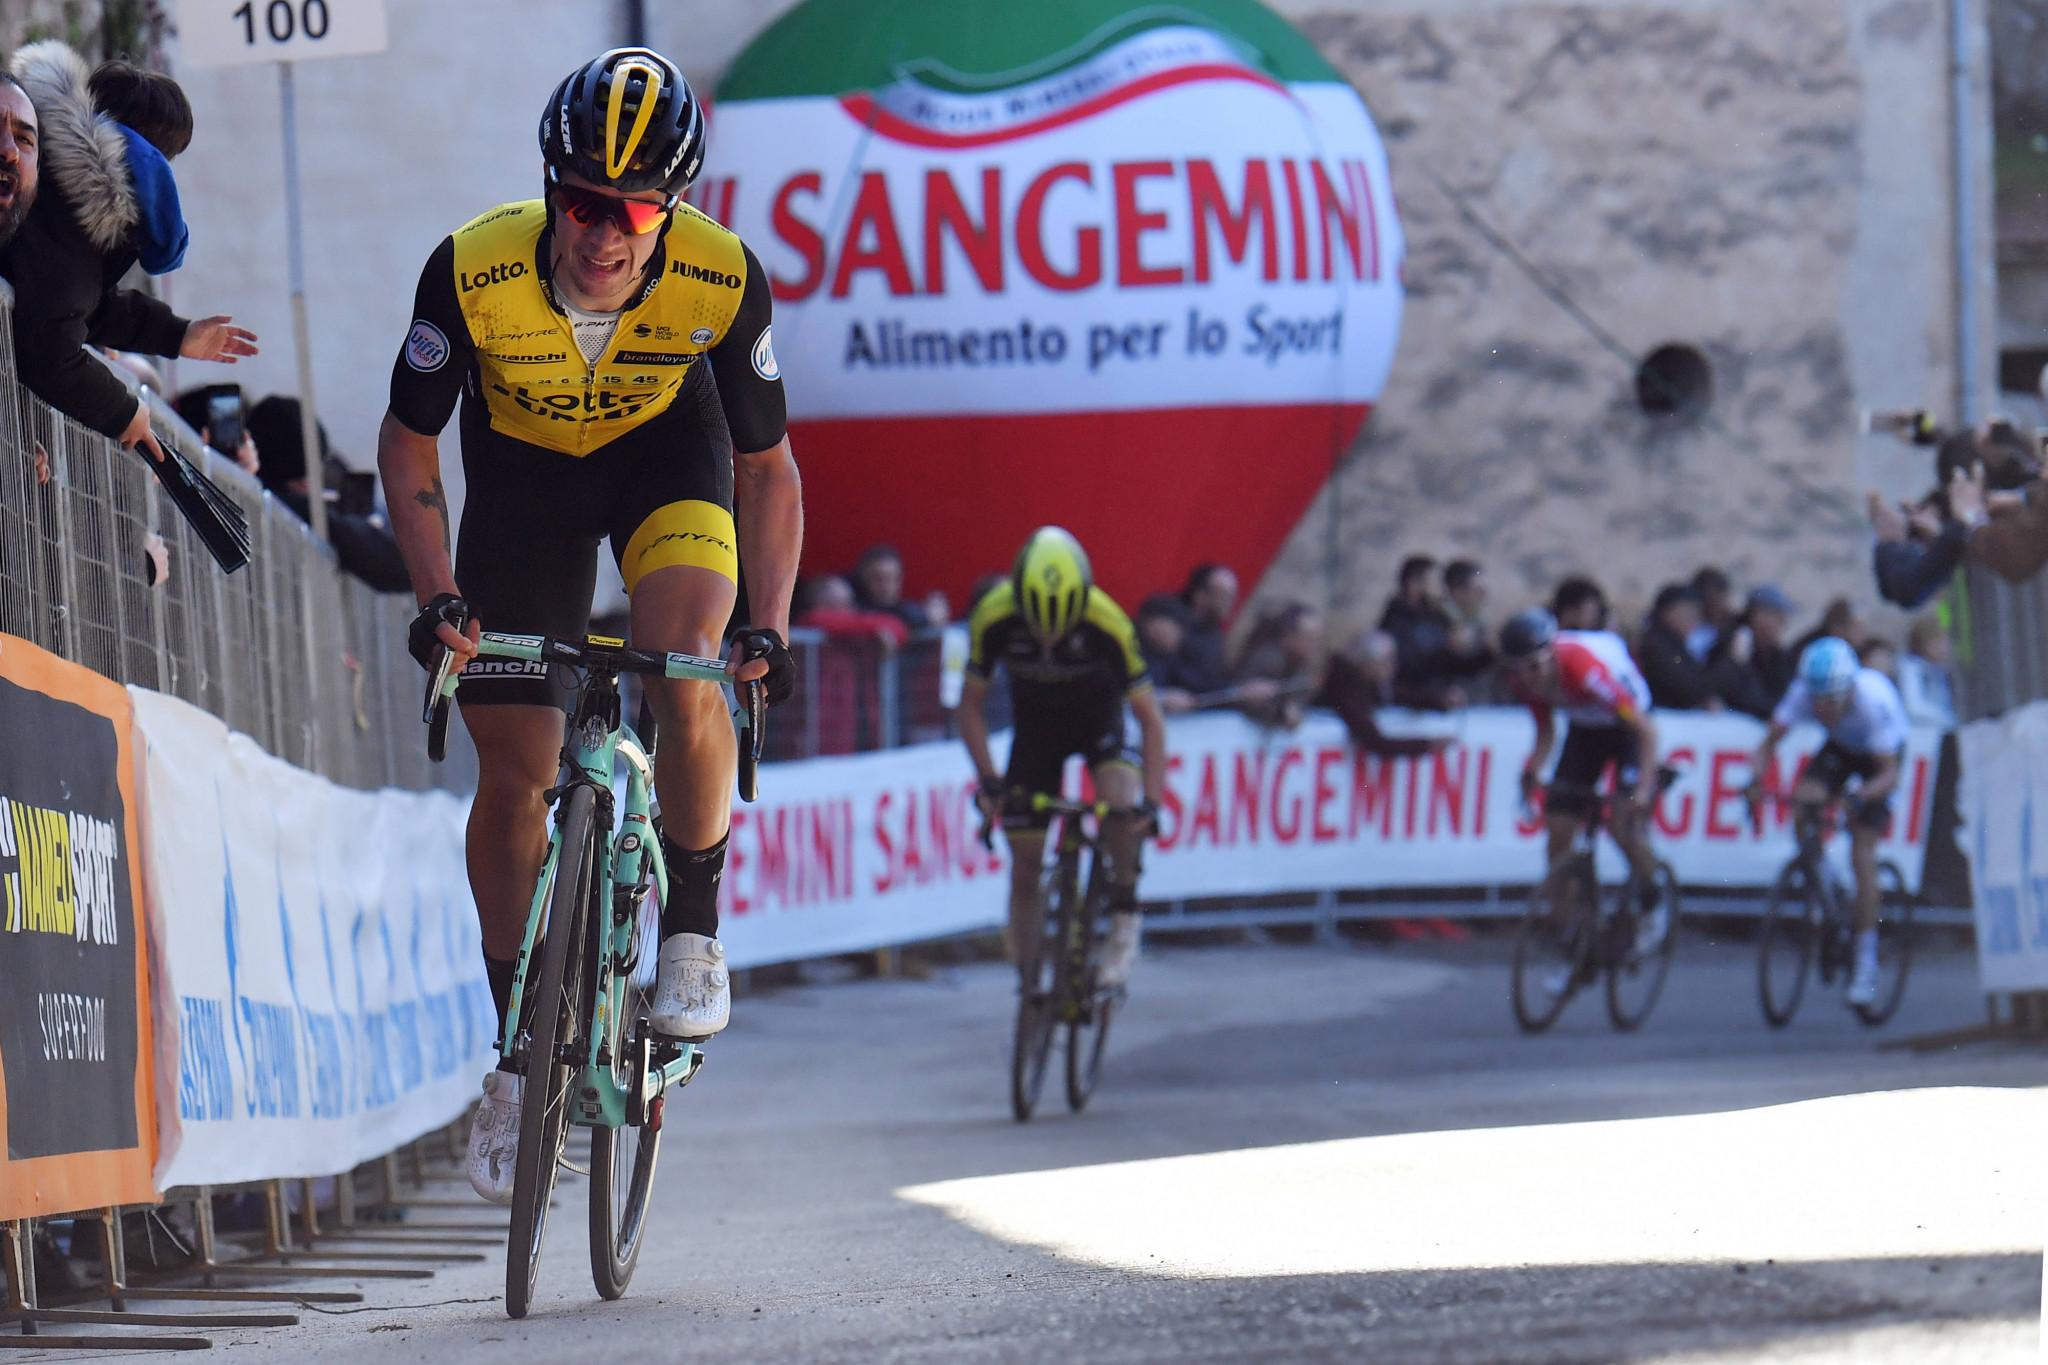 Slovenia's Primož Roglič climbed to victory on stage three of Tirreno-Adriatico ©LaPresse